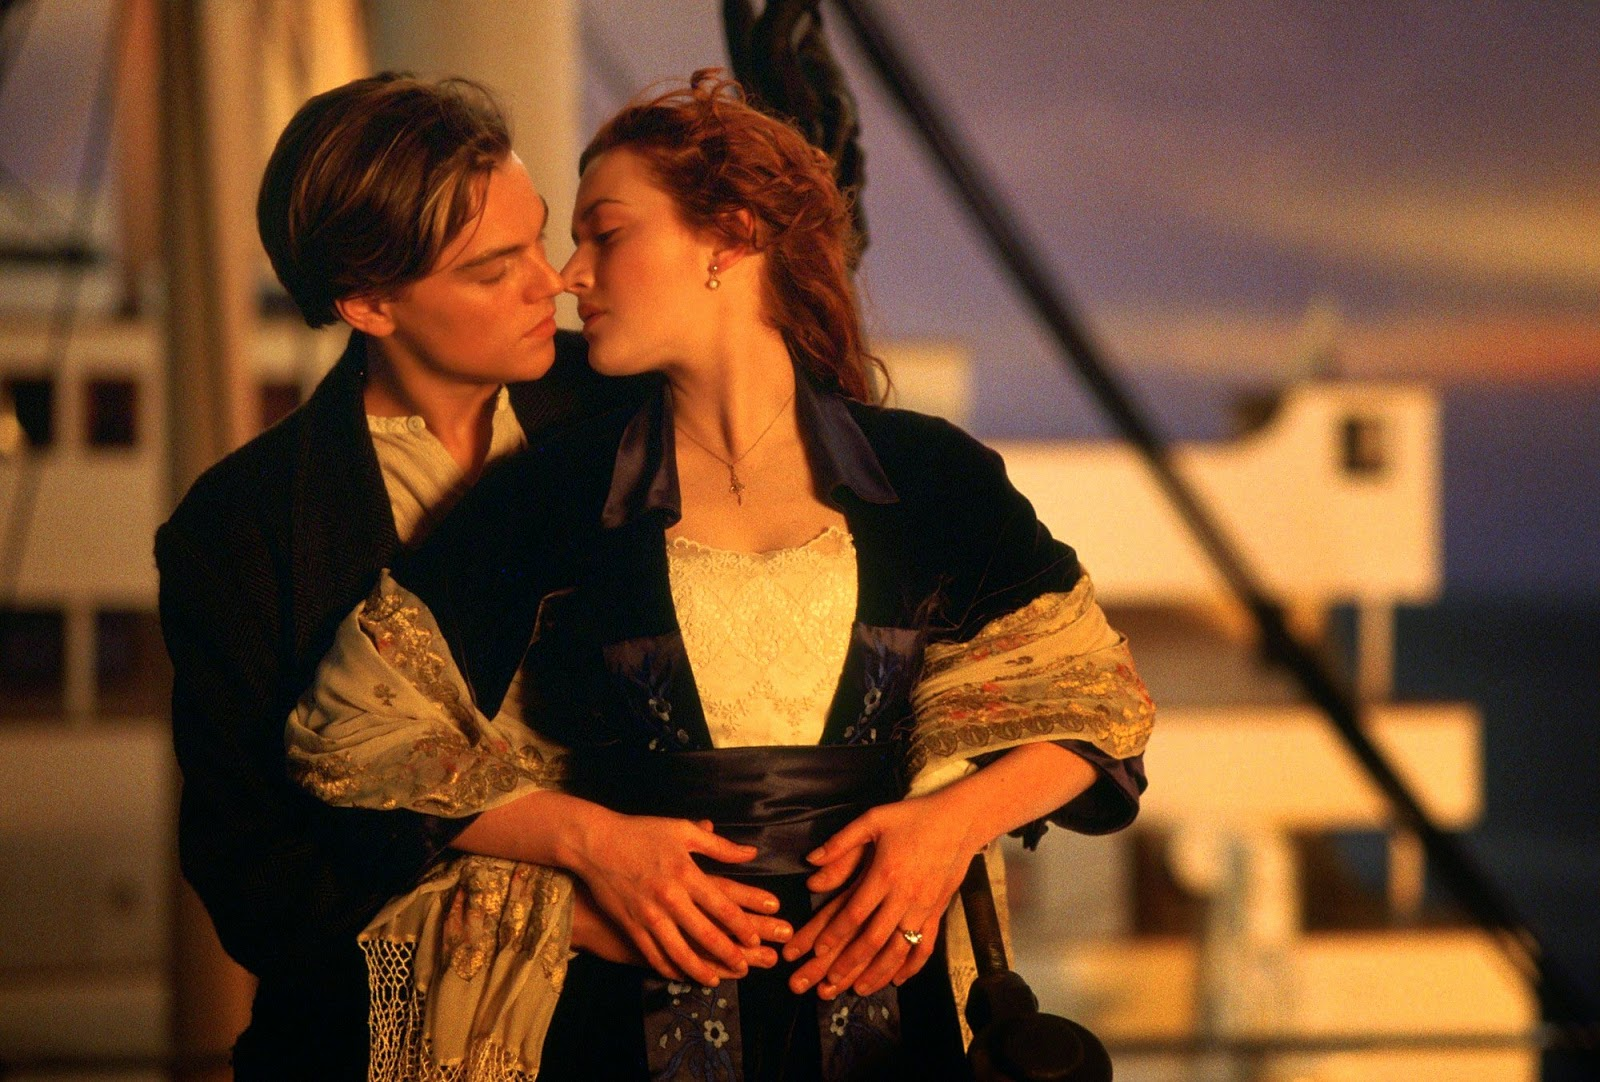 romantic english movies